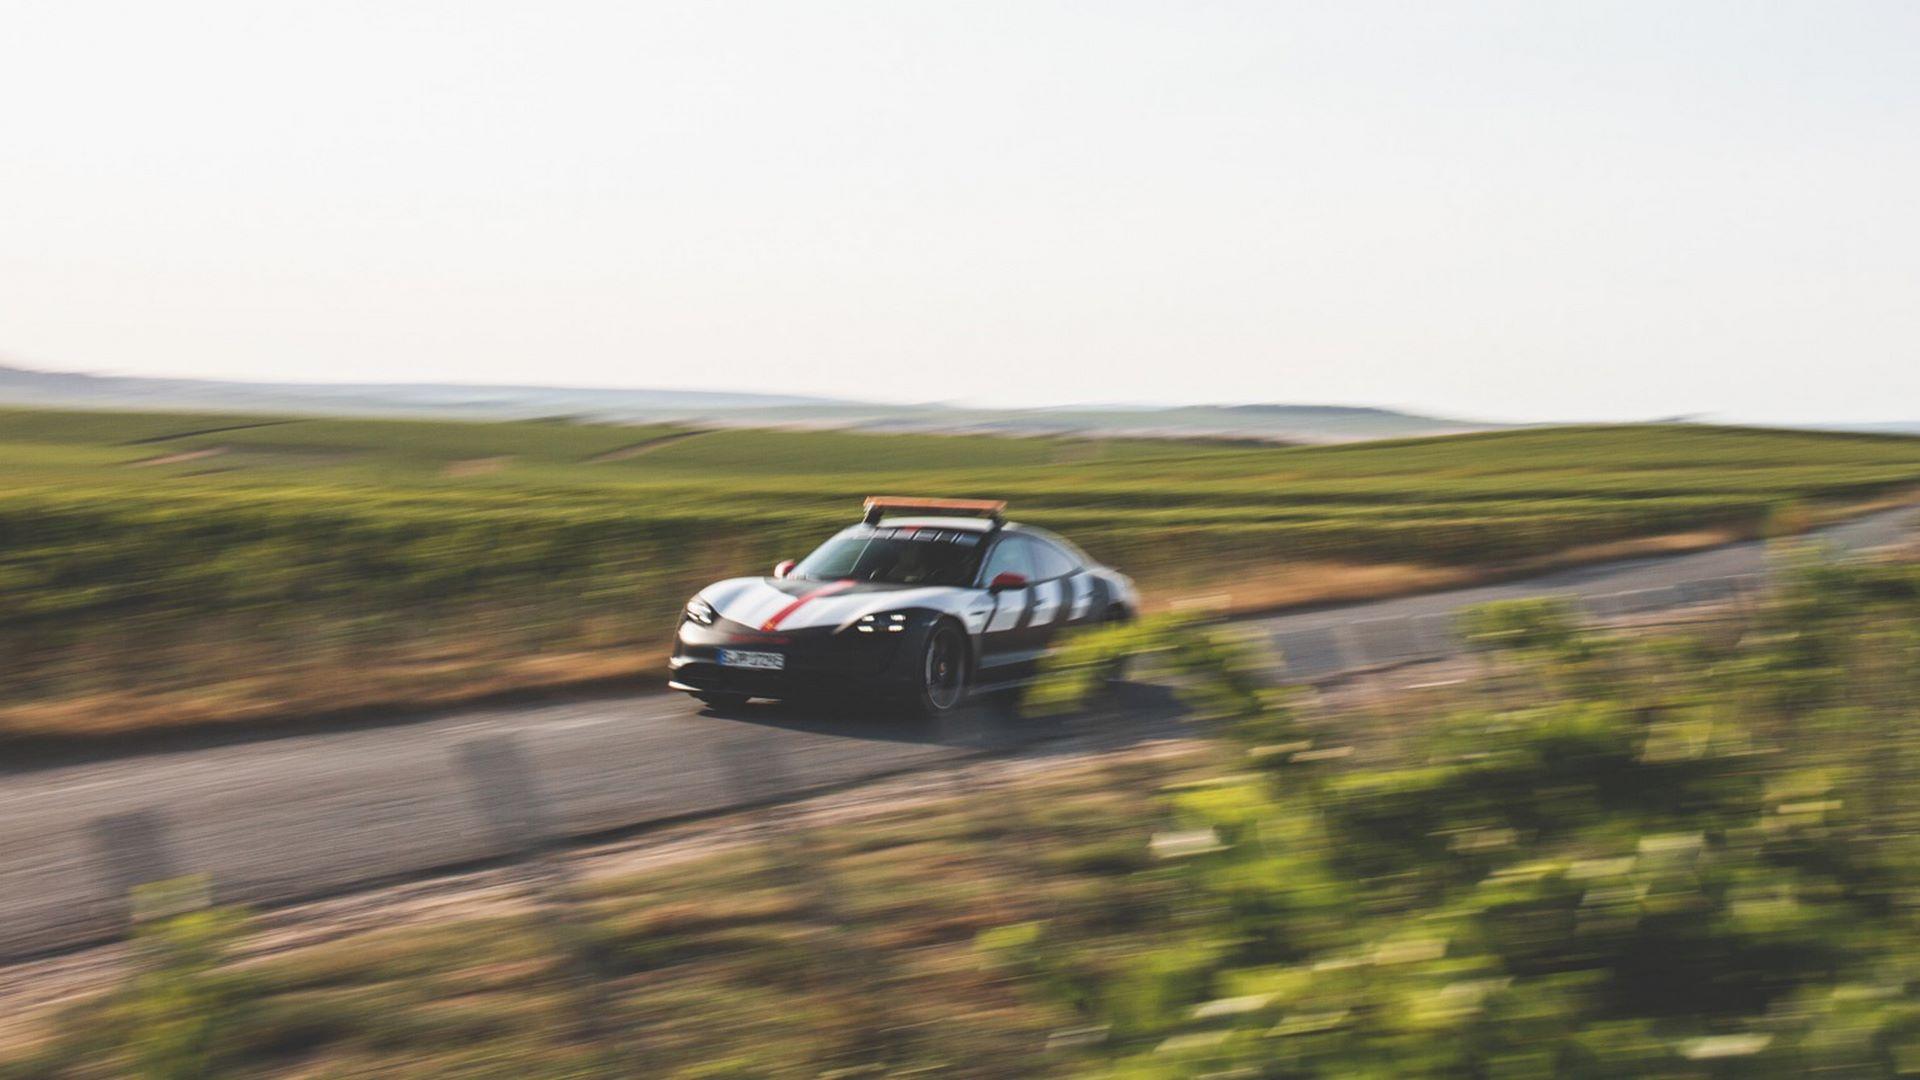 Porsche-Taycan-Turbo-safety-car-Le-Mans-2020-12